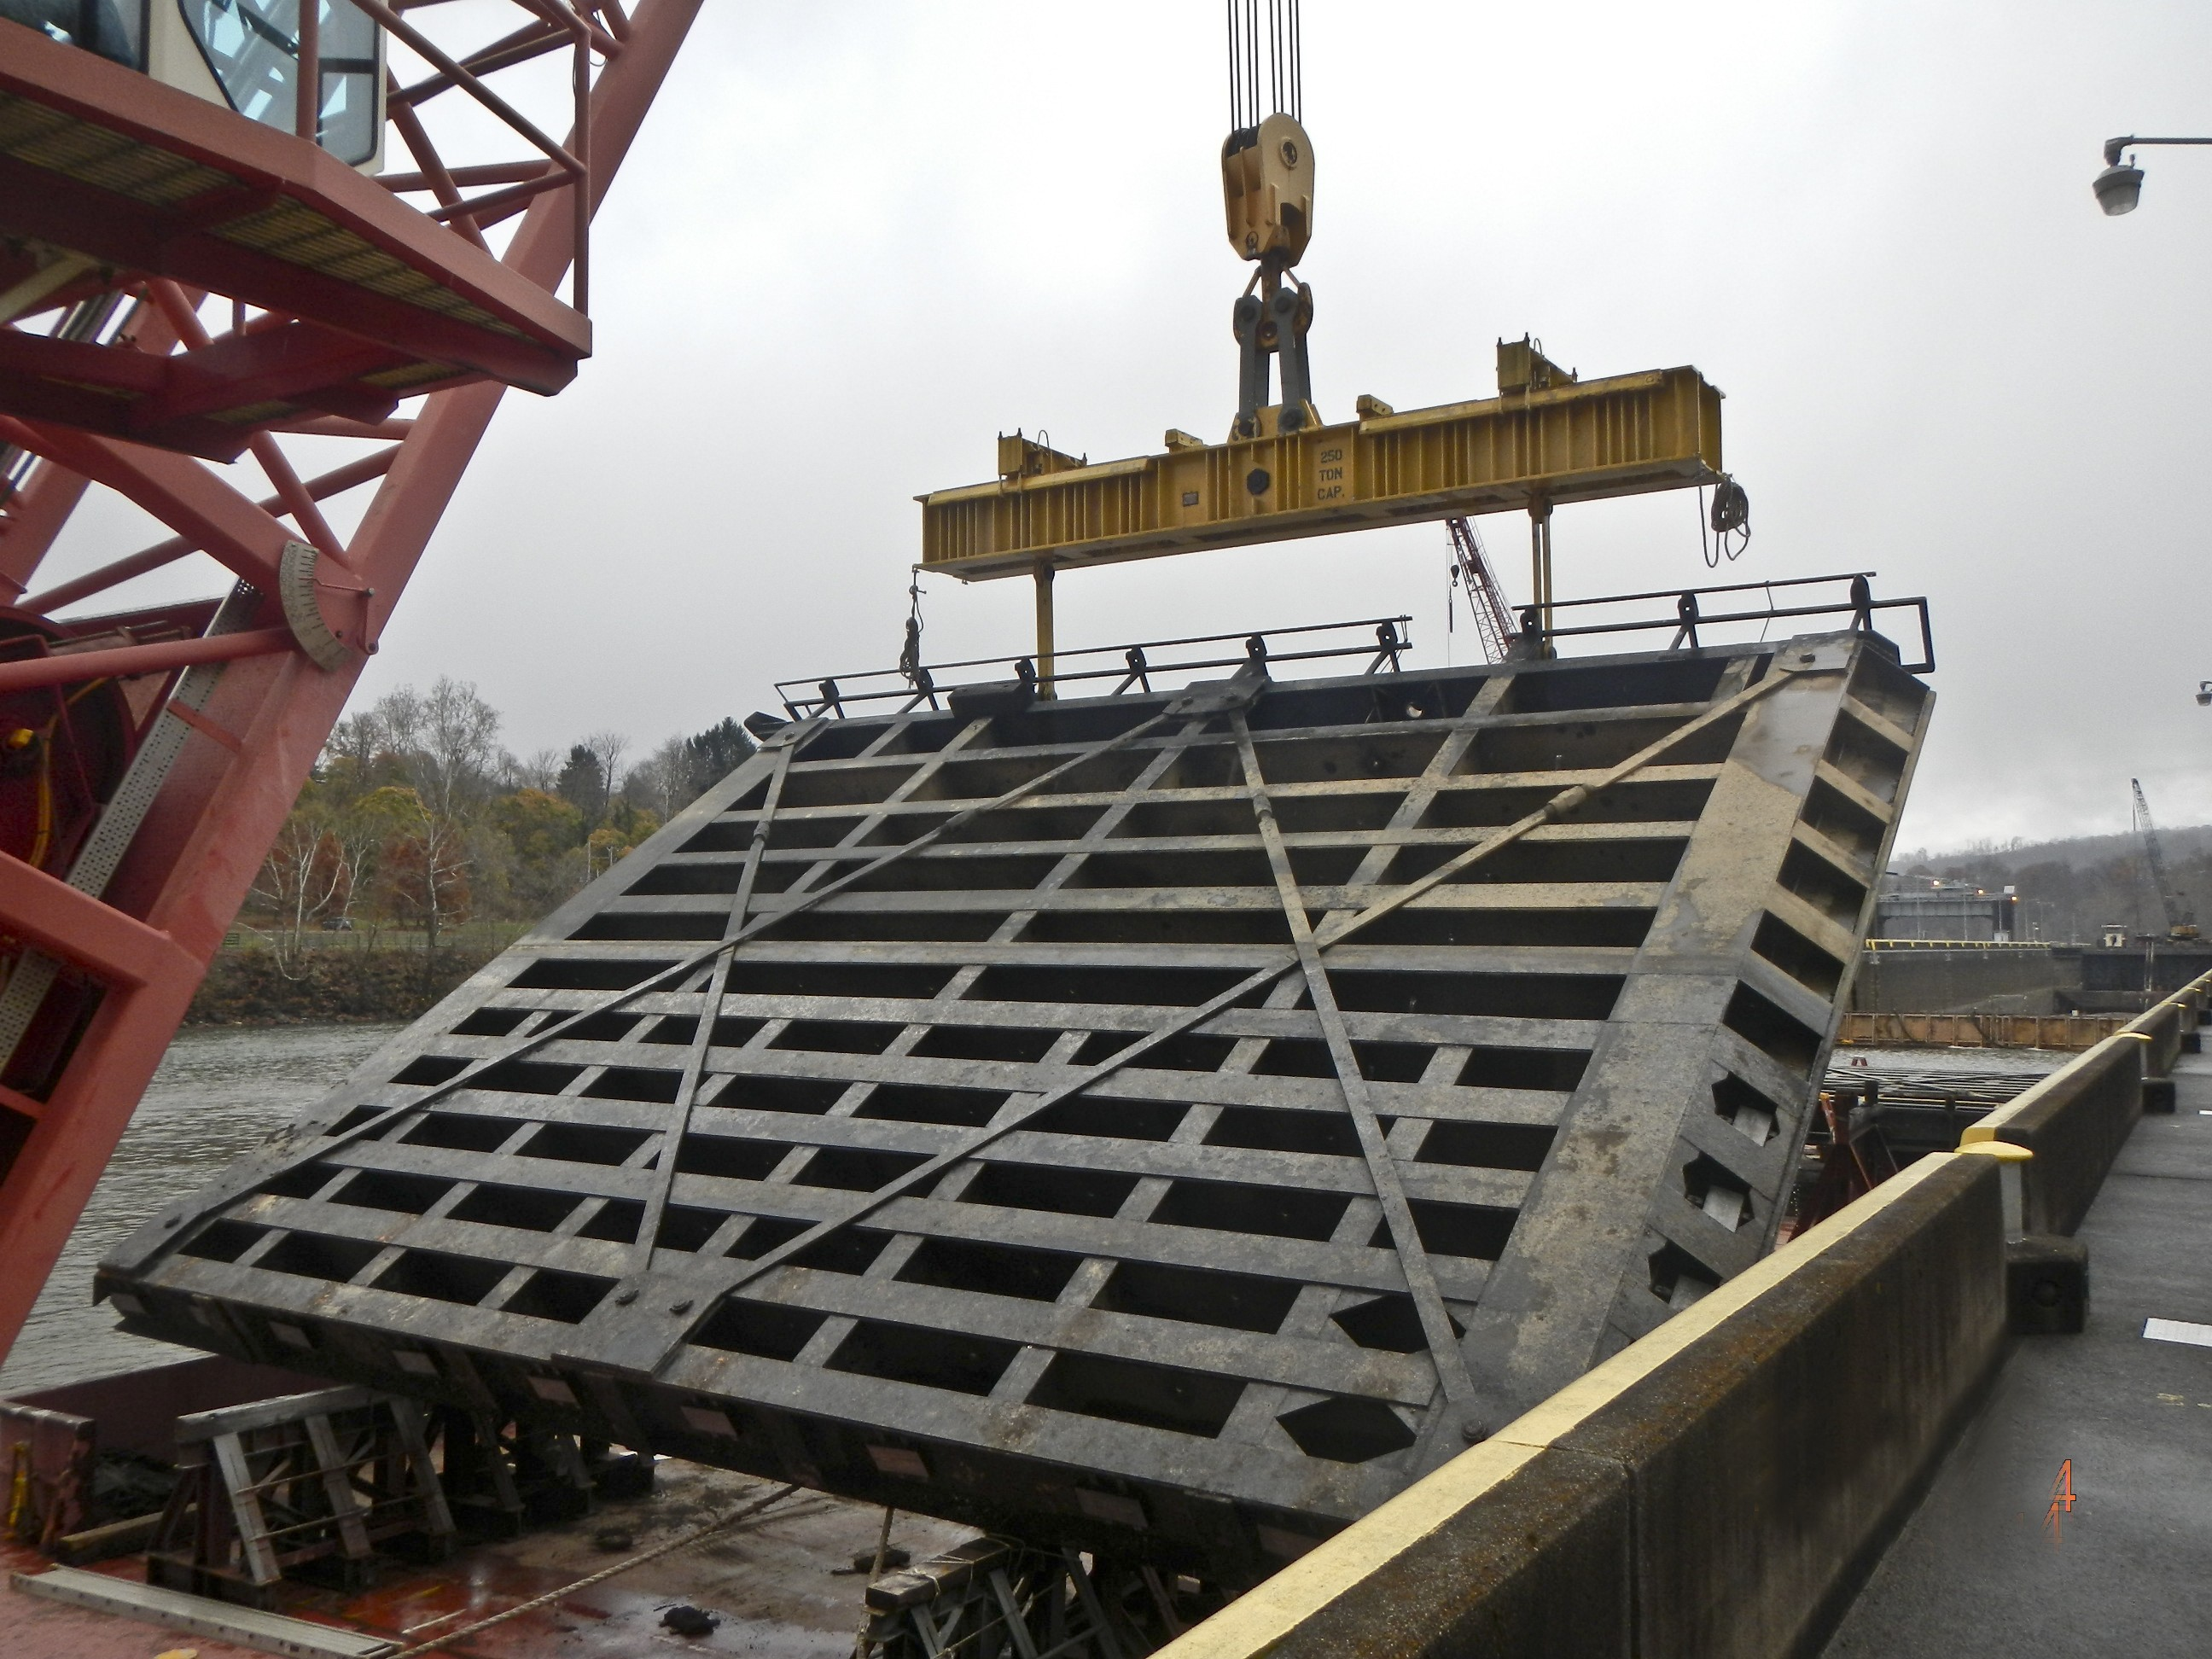 Morgantown Lock Dewatering Reveals Severe Damage Article